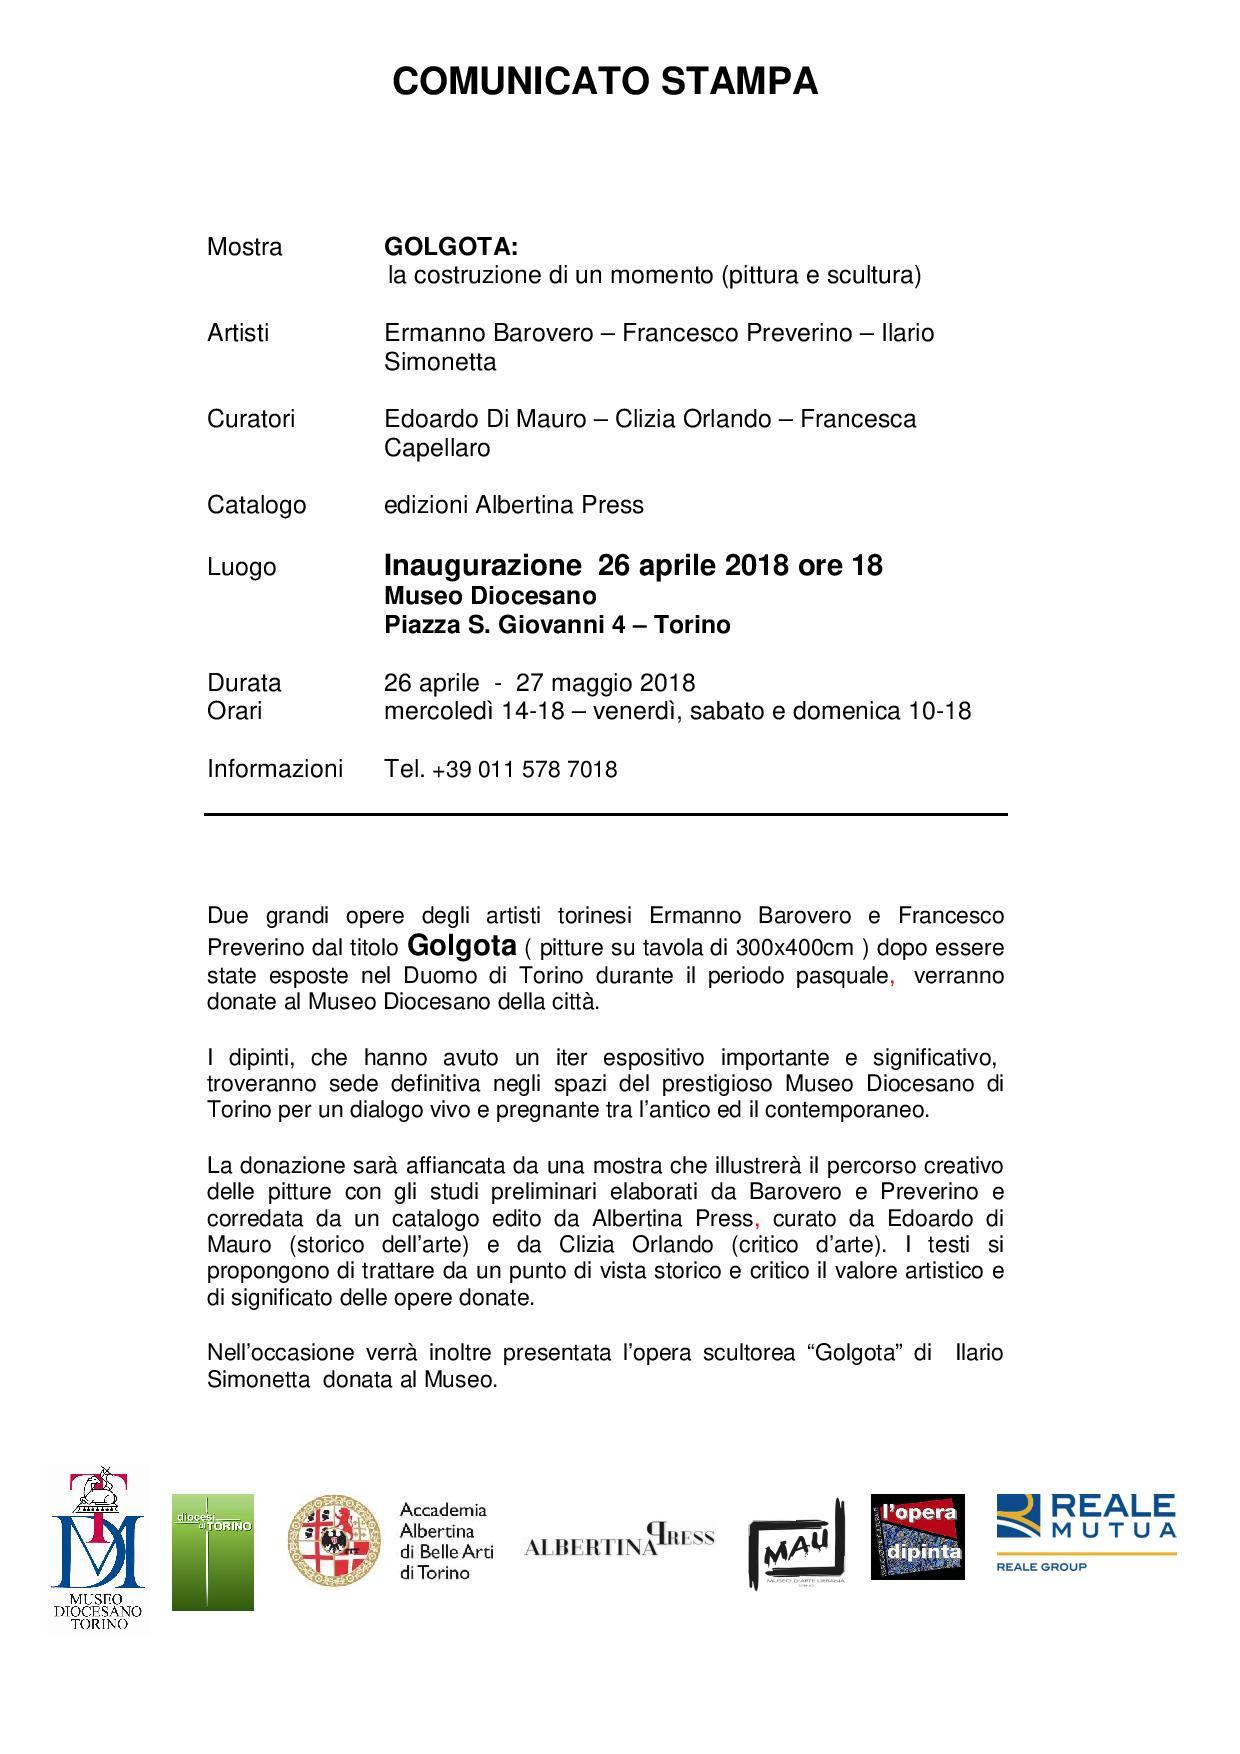 COMUNICATO STAMPA GOLGOTA-page-001